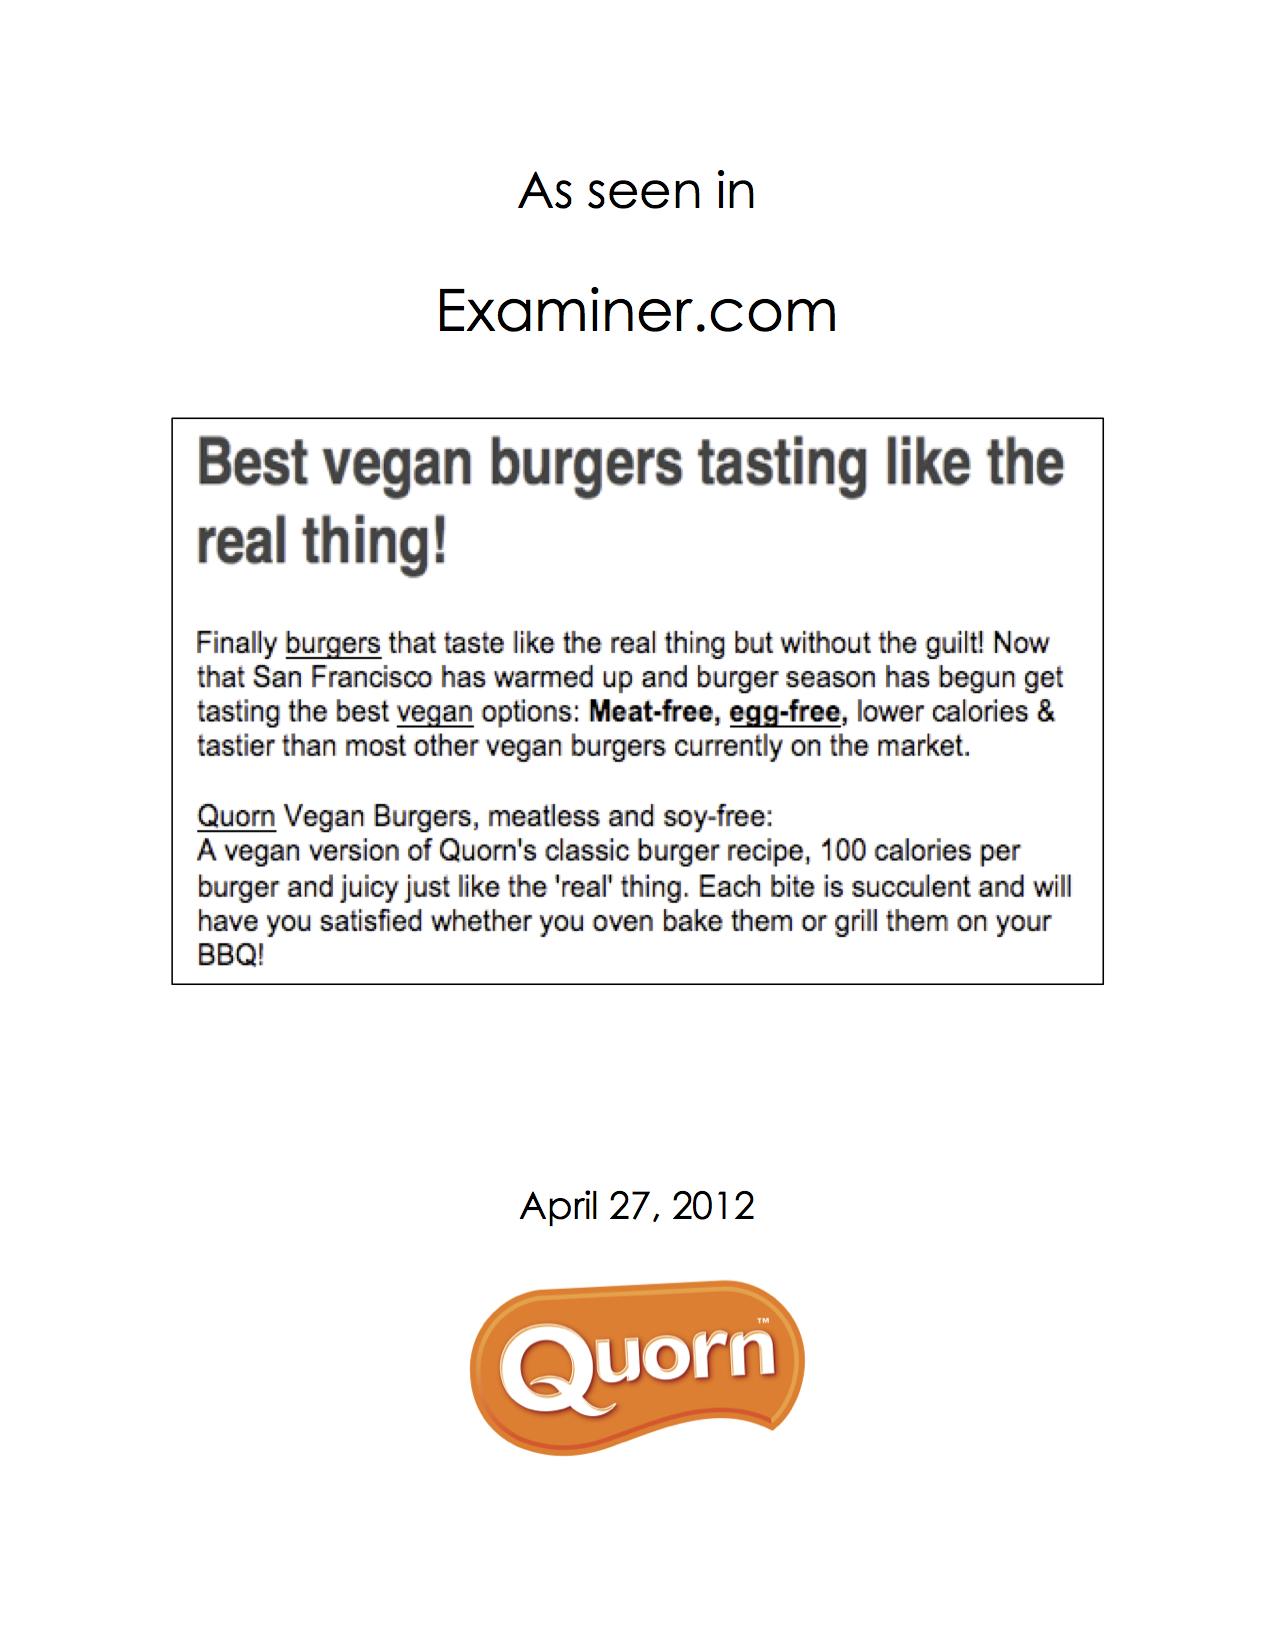 quorncoverage-examiner.jpg